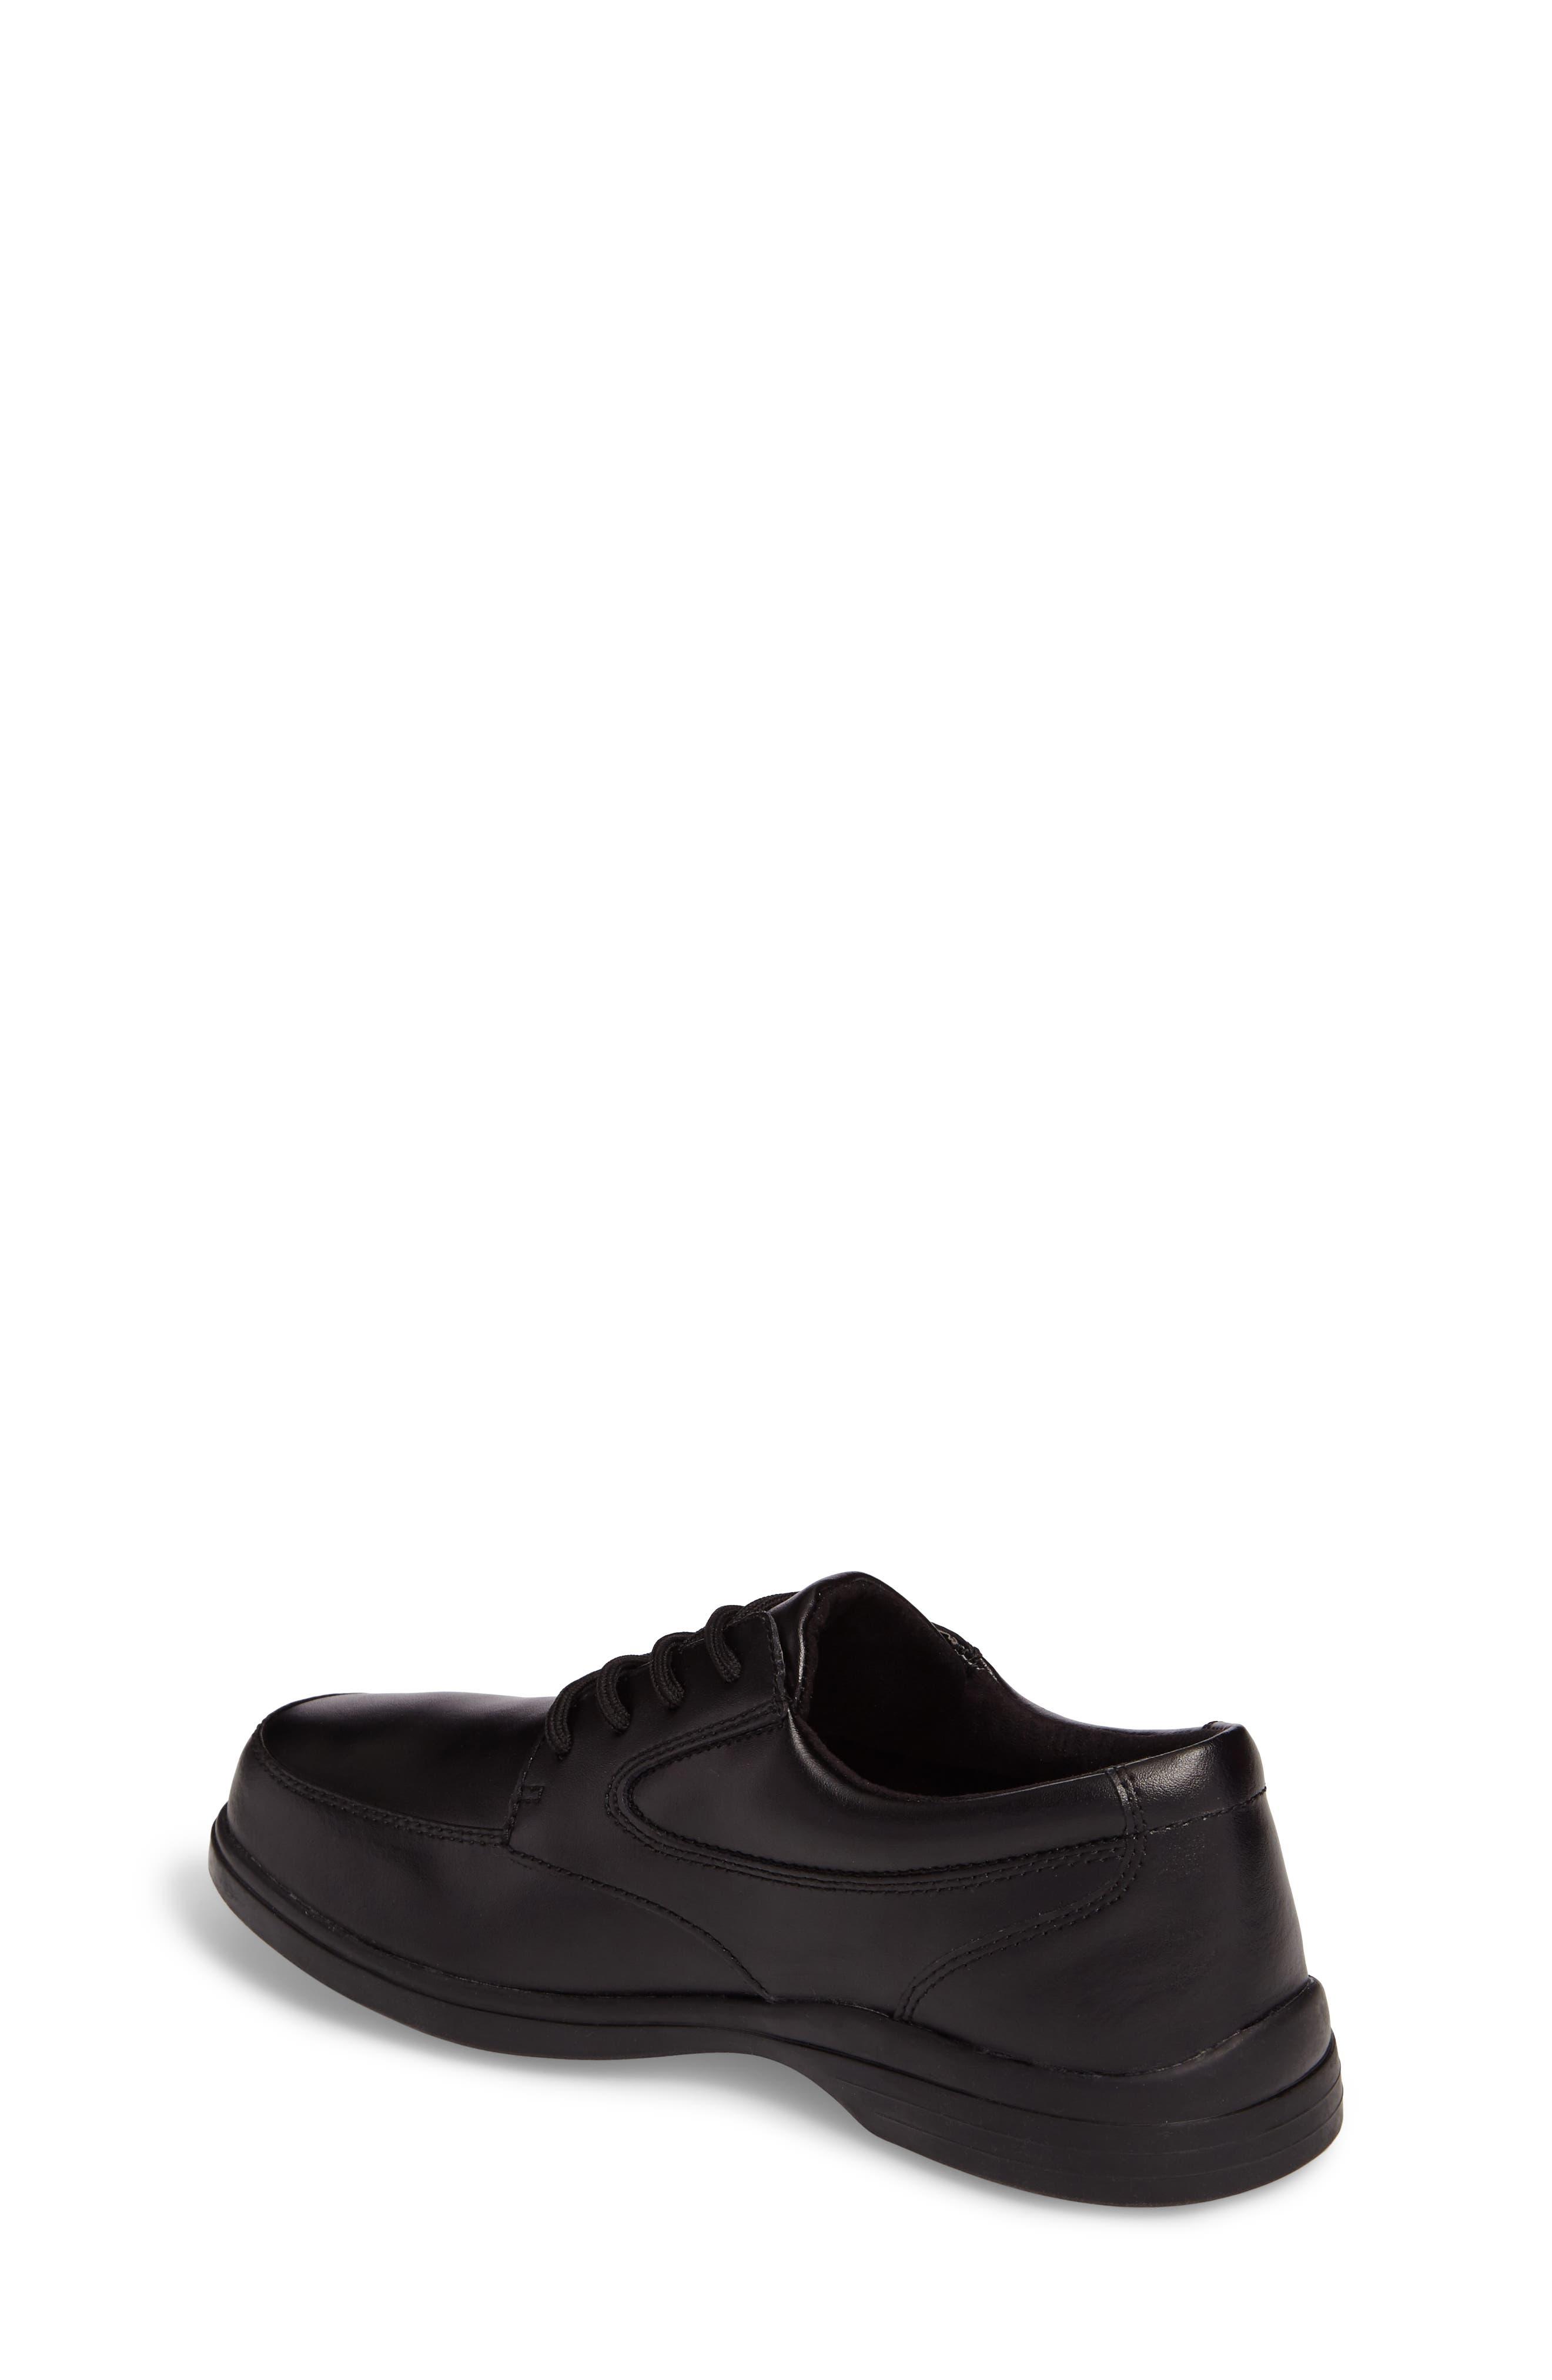 Ty Dress Shoe,                             Alternate thumbnail 2, color,                             BLACK LEATHER